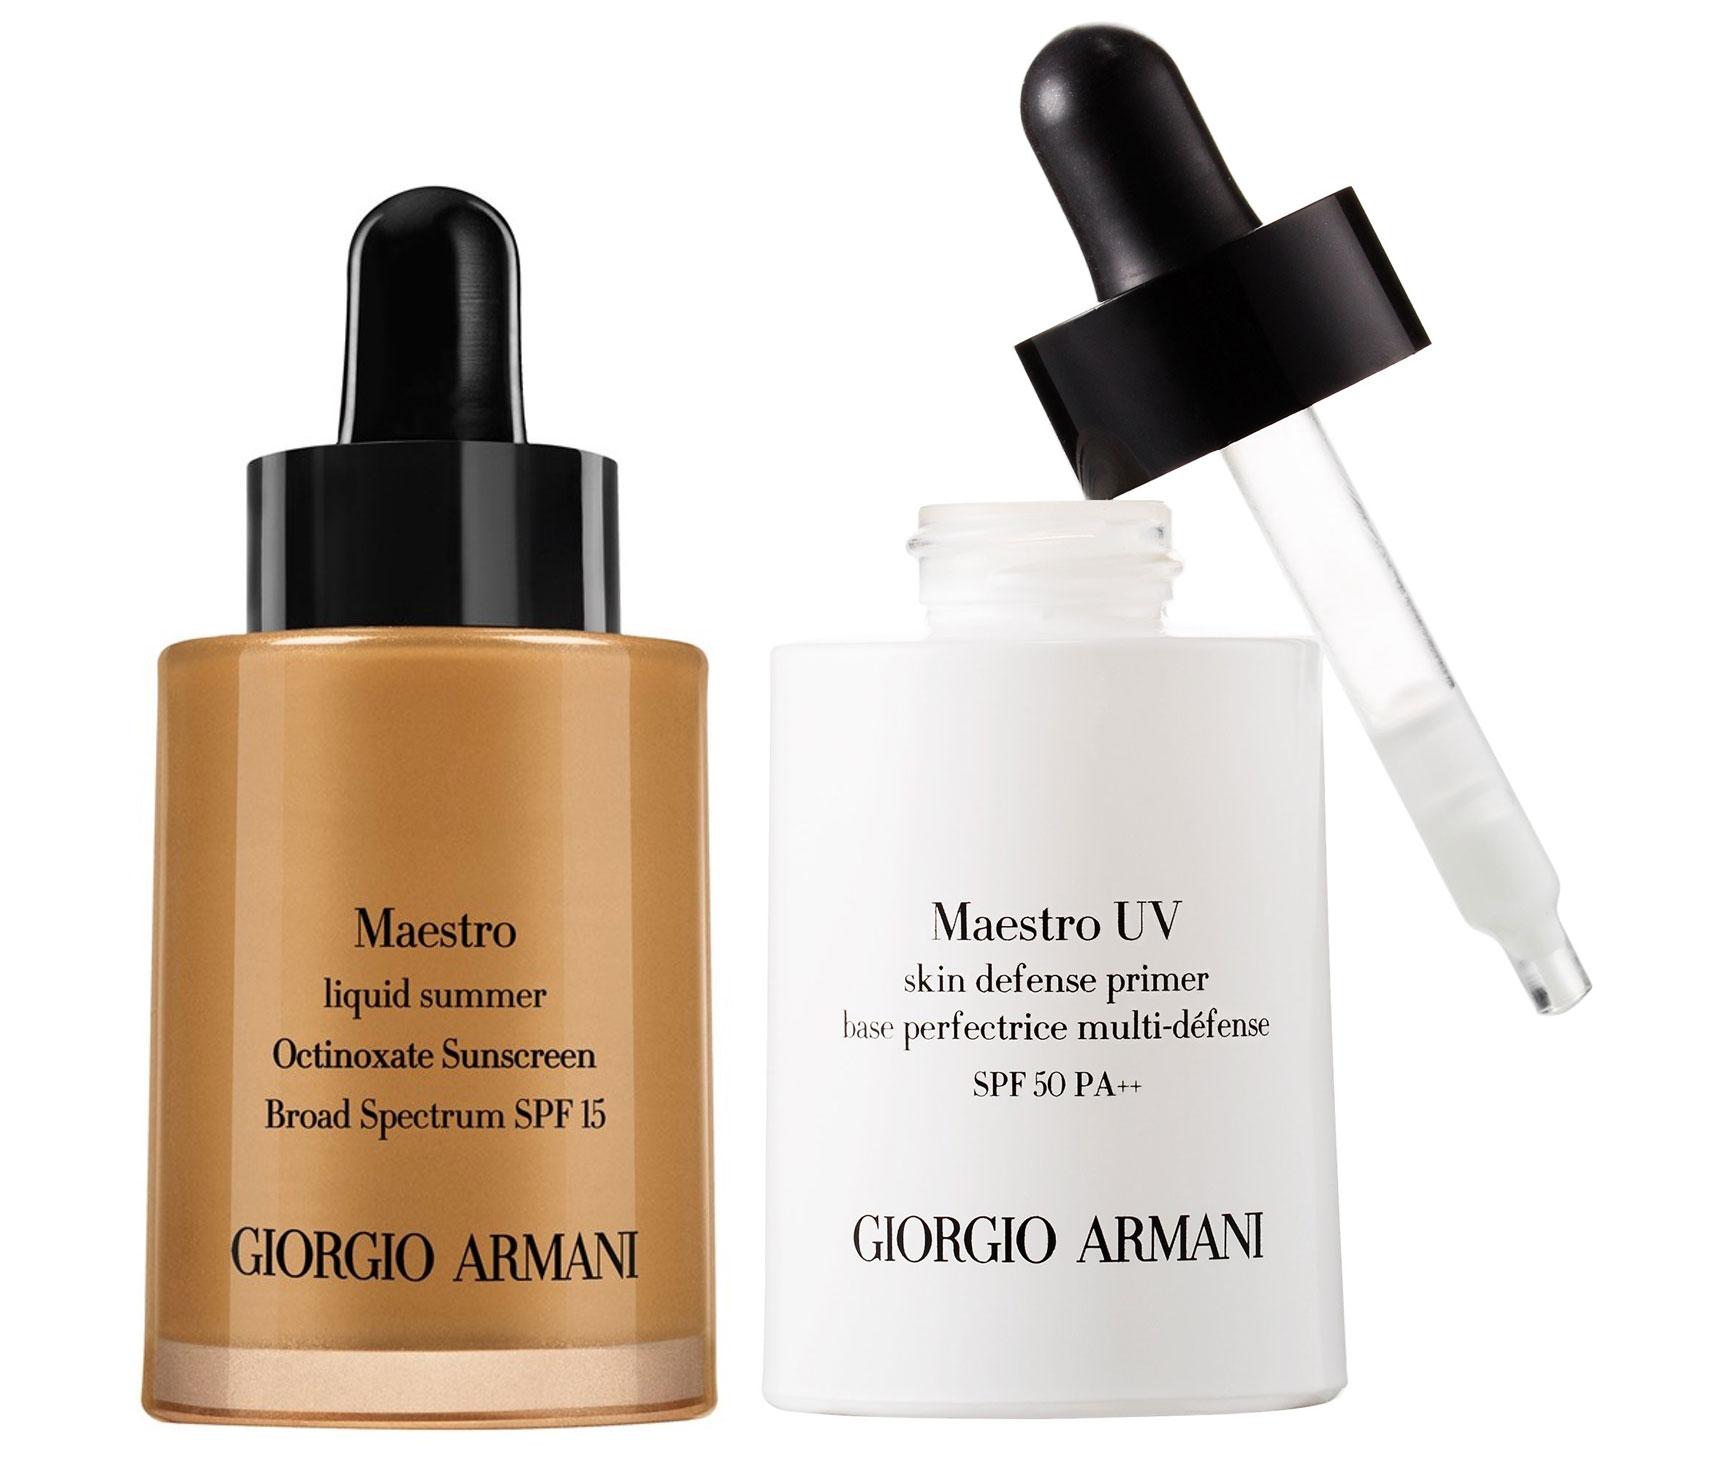 Armani-Maestro-Liquid-Summer-and-Maestro-UV-Primer